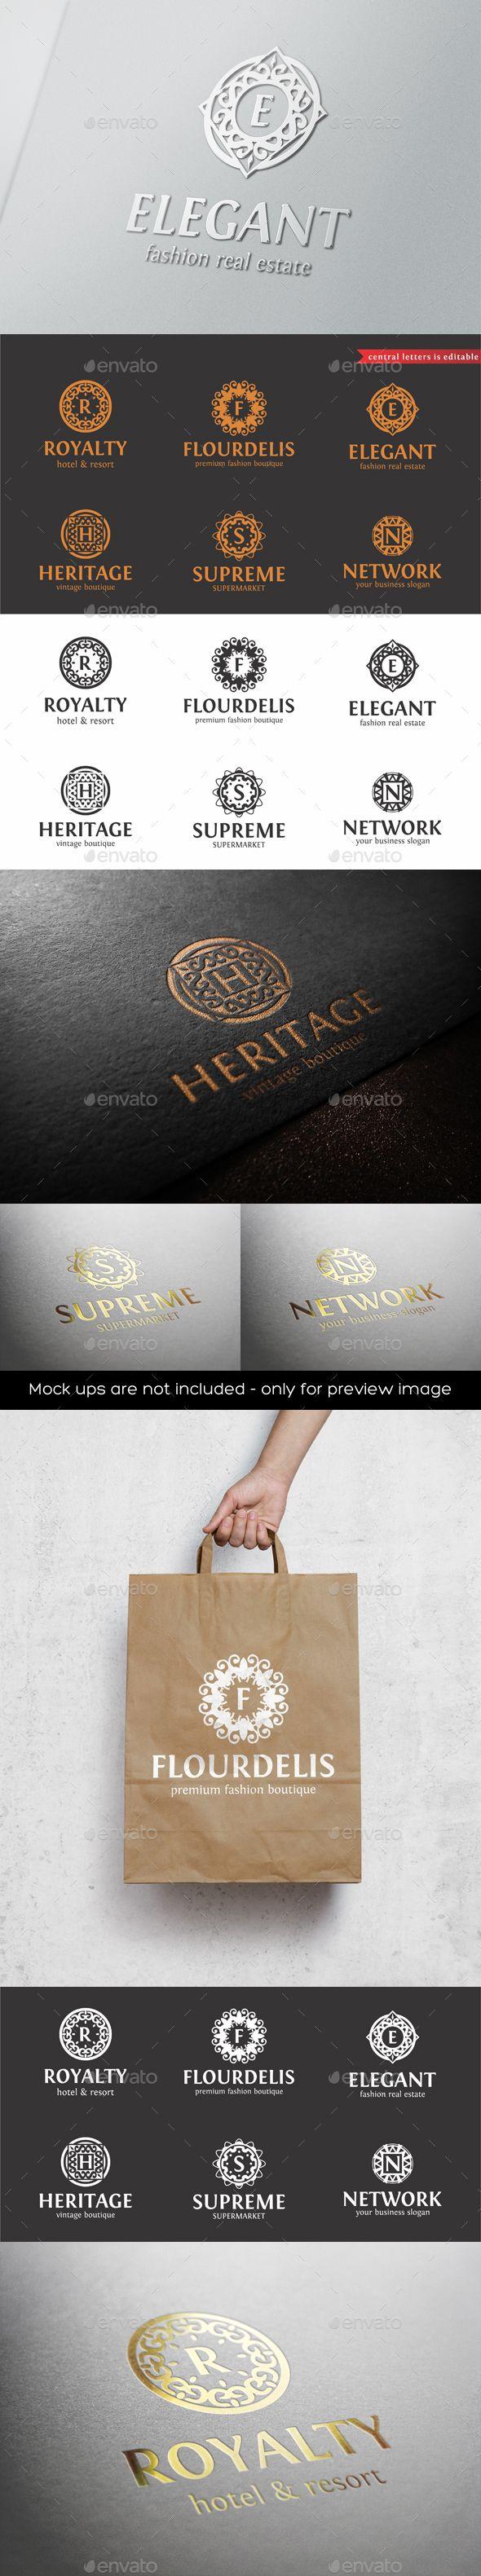 Elegant Boutique Logo Badges Monogram  — EPS Template #apartment #romantic wedding • Download ➝ https://graphicriver.net/item/elegant-boutique-logo-badges-monogram/18161027?ref=pxcr